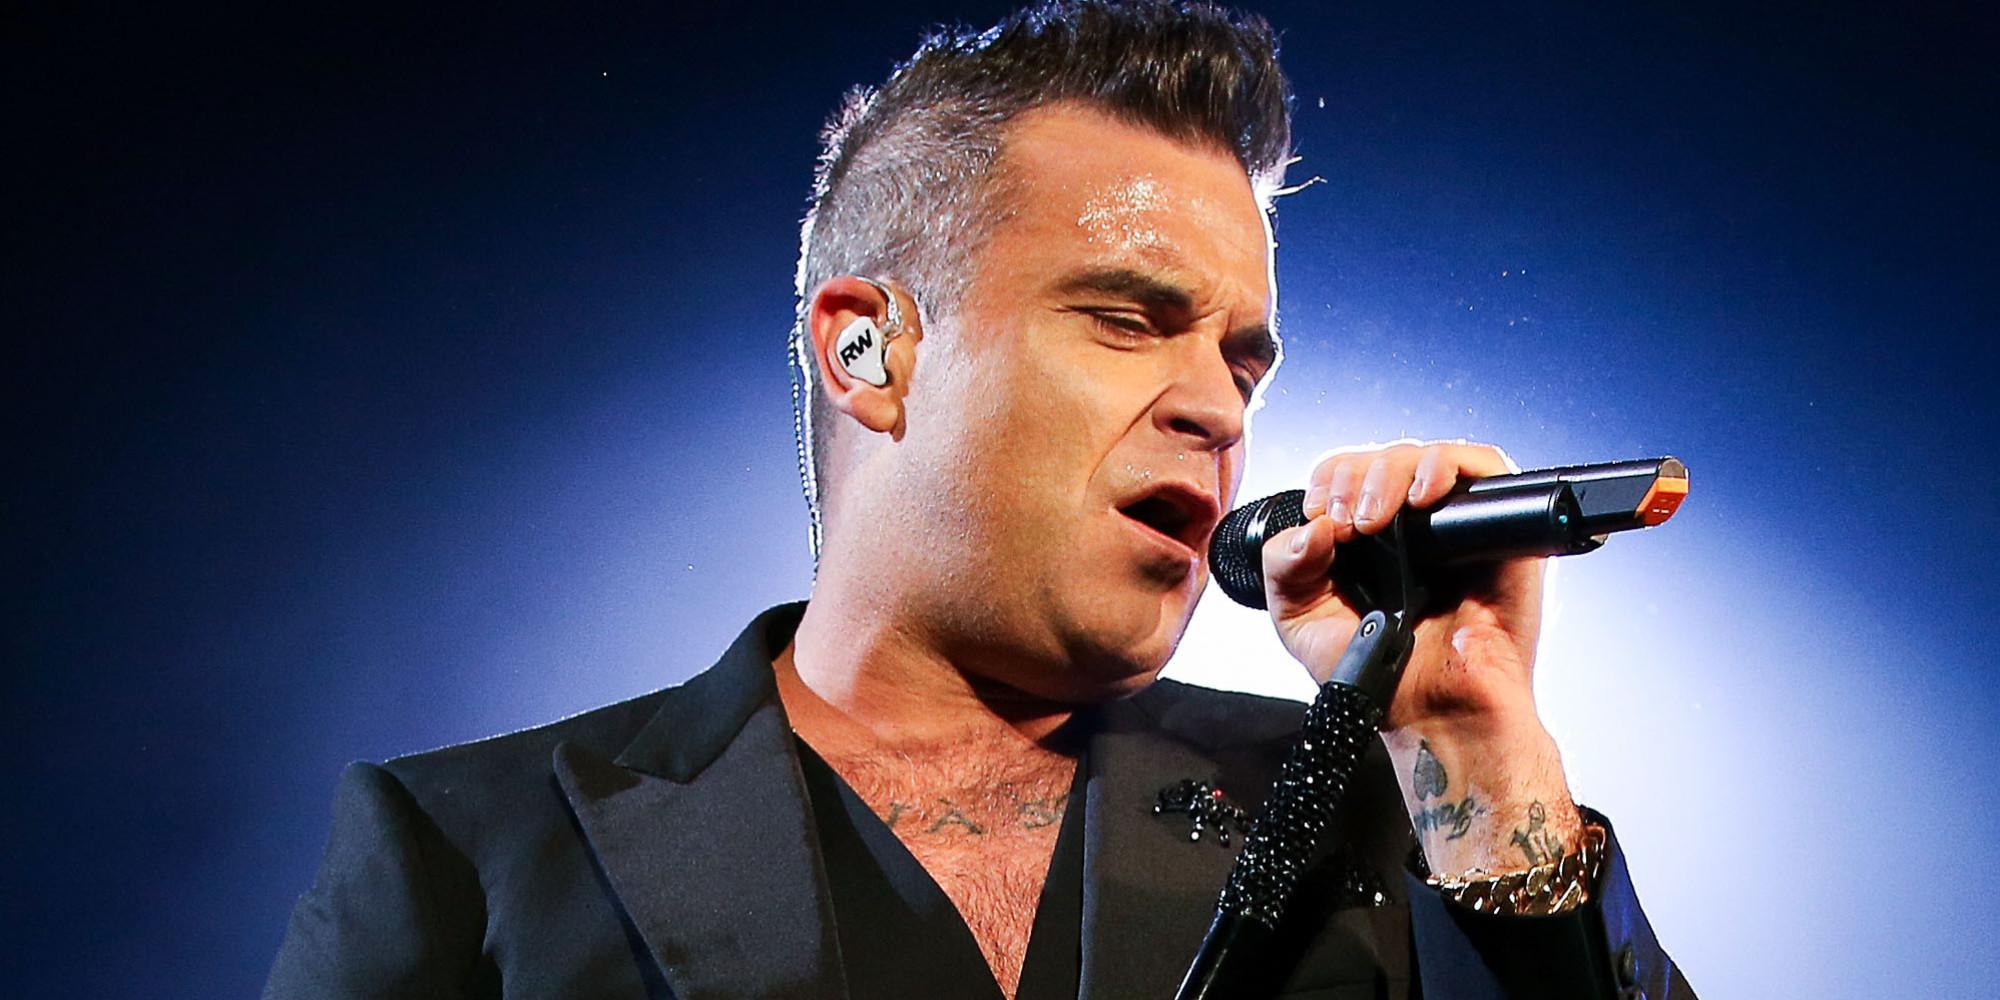 Robbie Williams предсказал стрельбу в Лас-Вегасе 15 лет назад